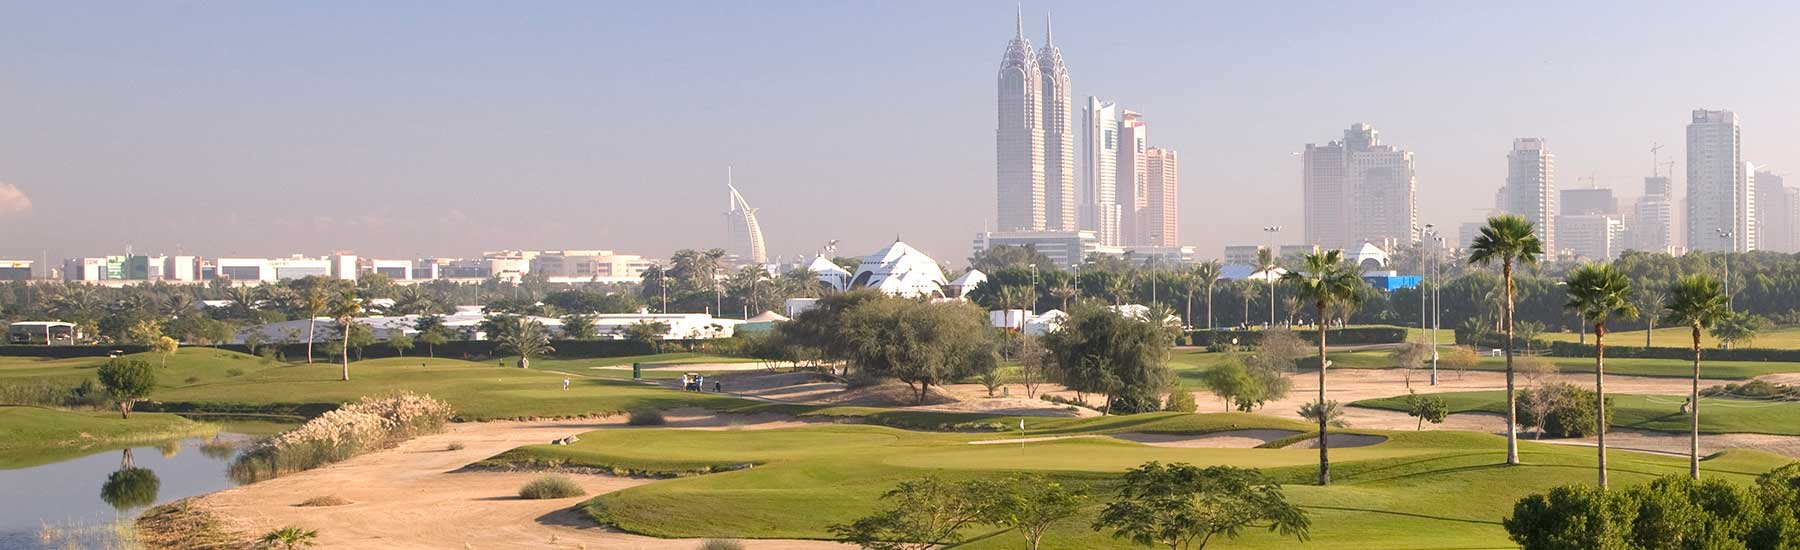 Guide to the Dubai Desert Classic